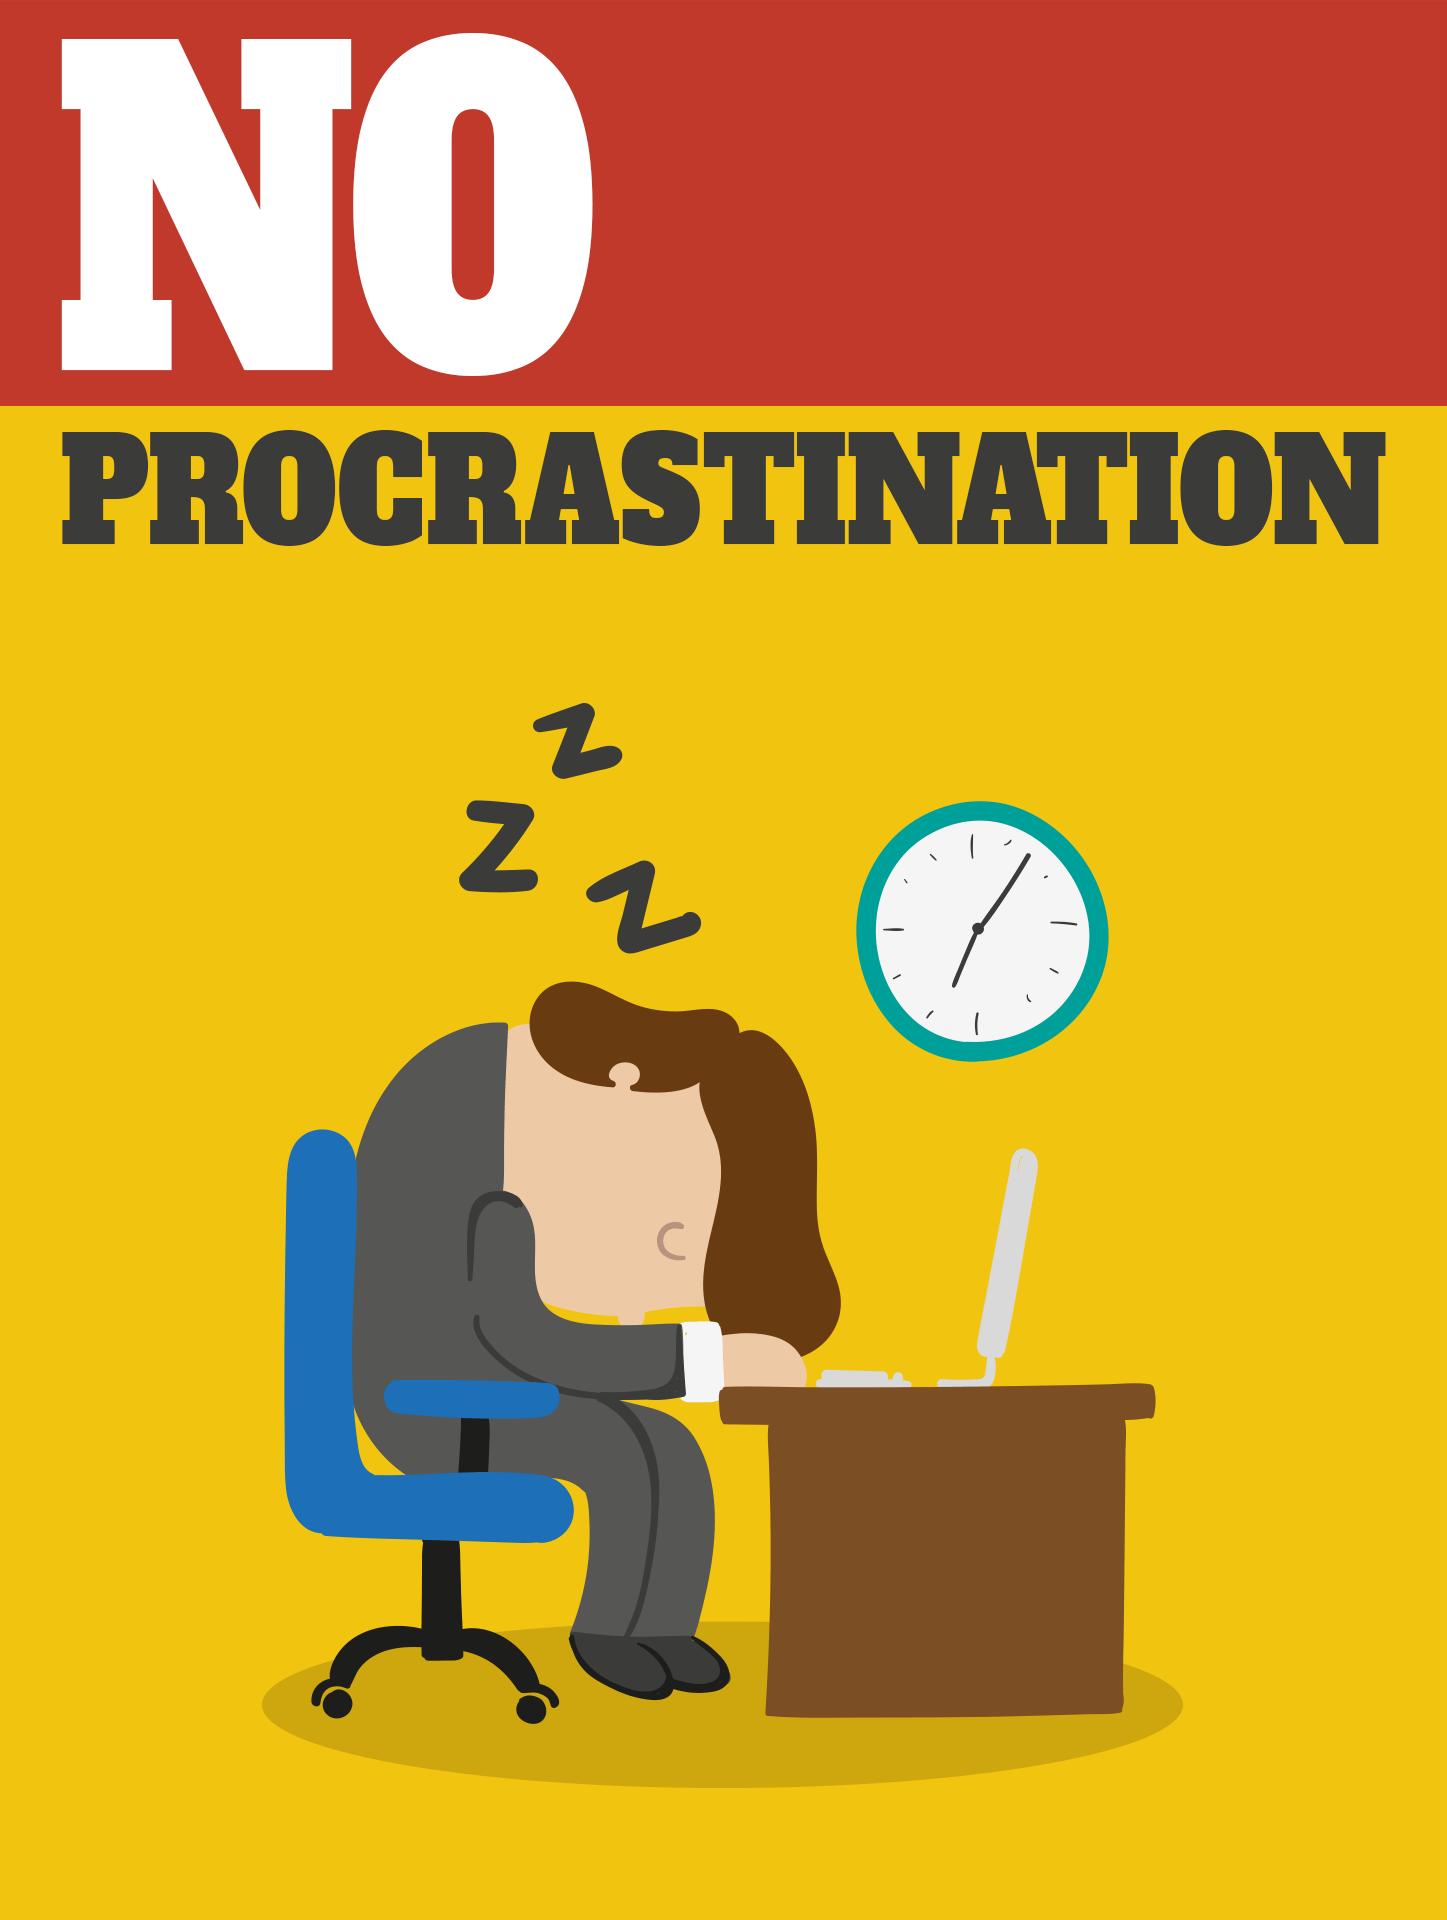 No Procrastination - The Lighter Side - Day Seven - Procrastination